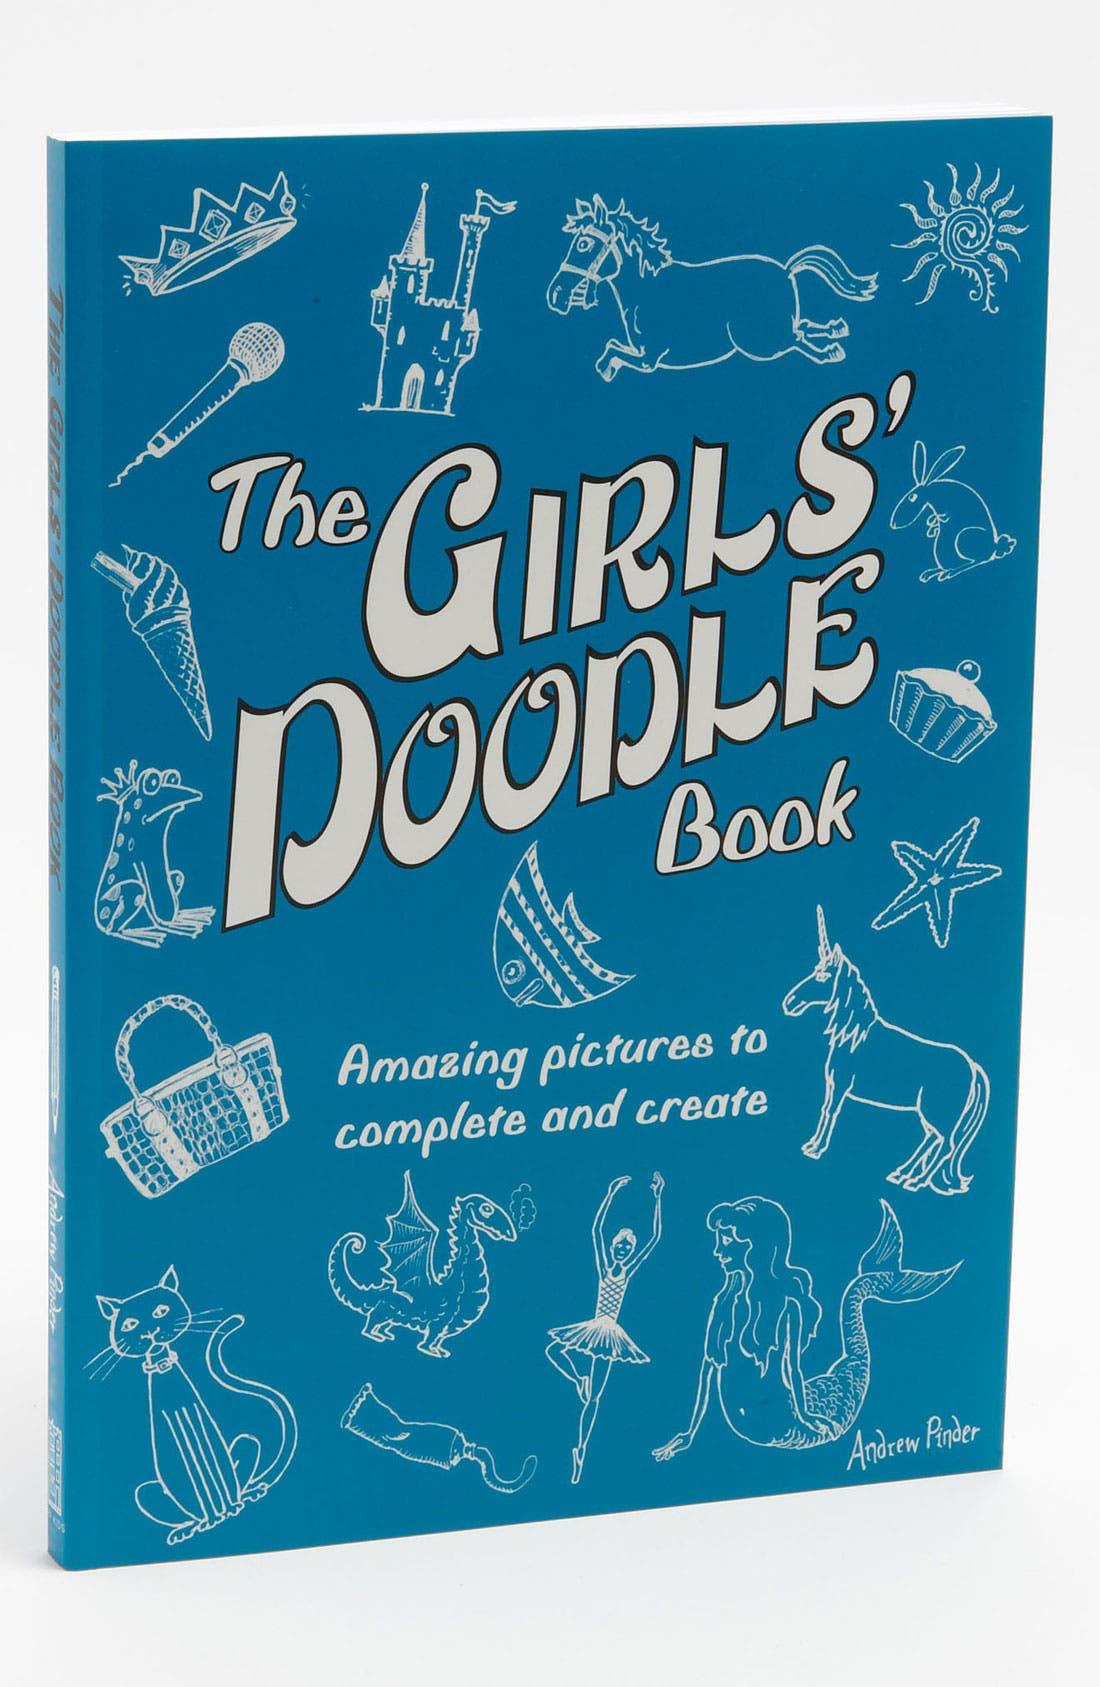 Alternate Image 1 Selected - Andrew Pinder 'The Girls' Doodle Book' Art Book (Girls)